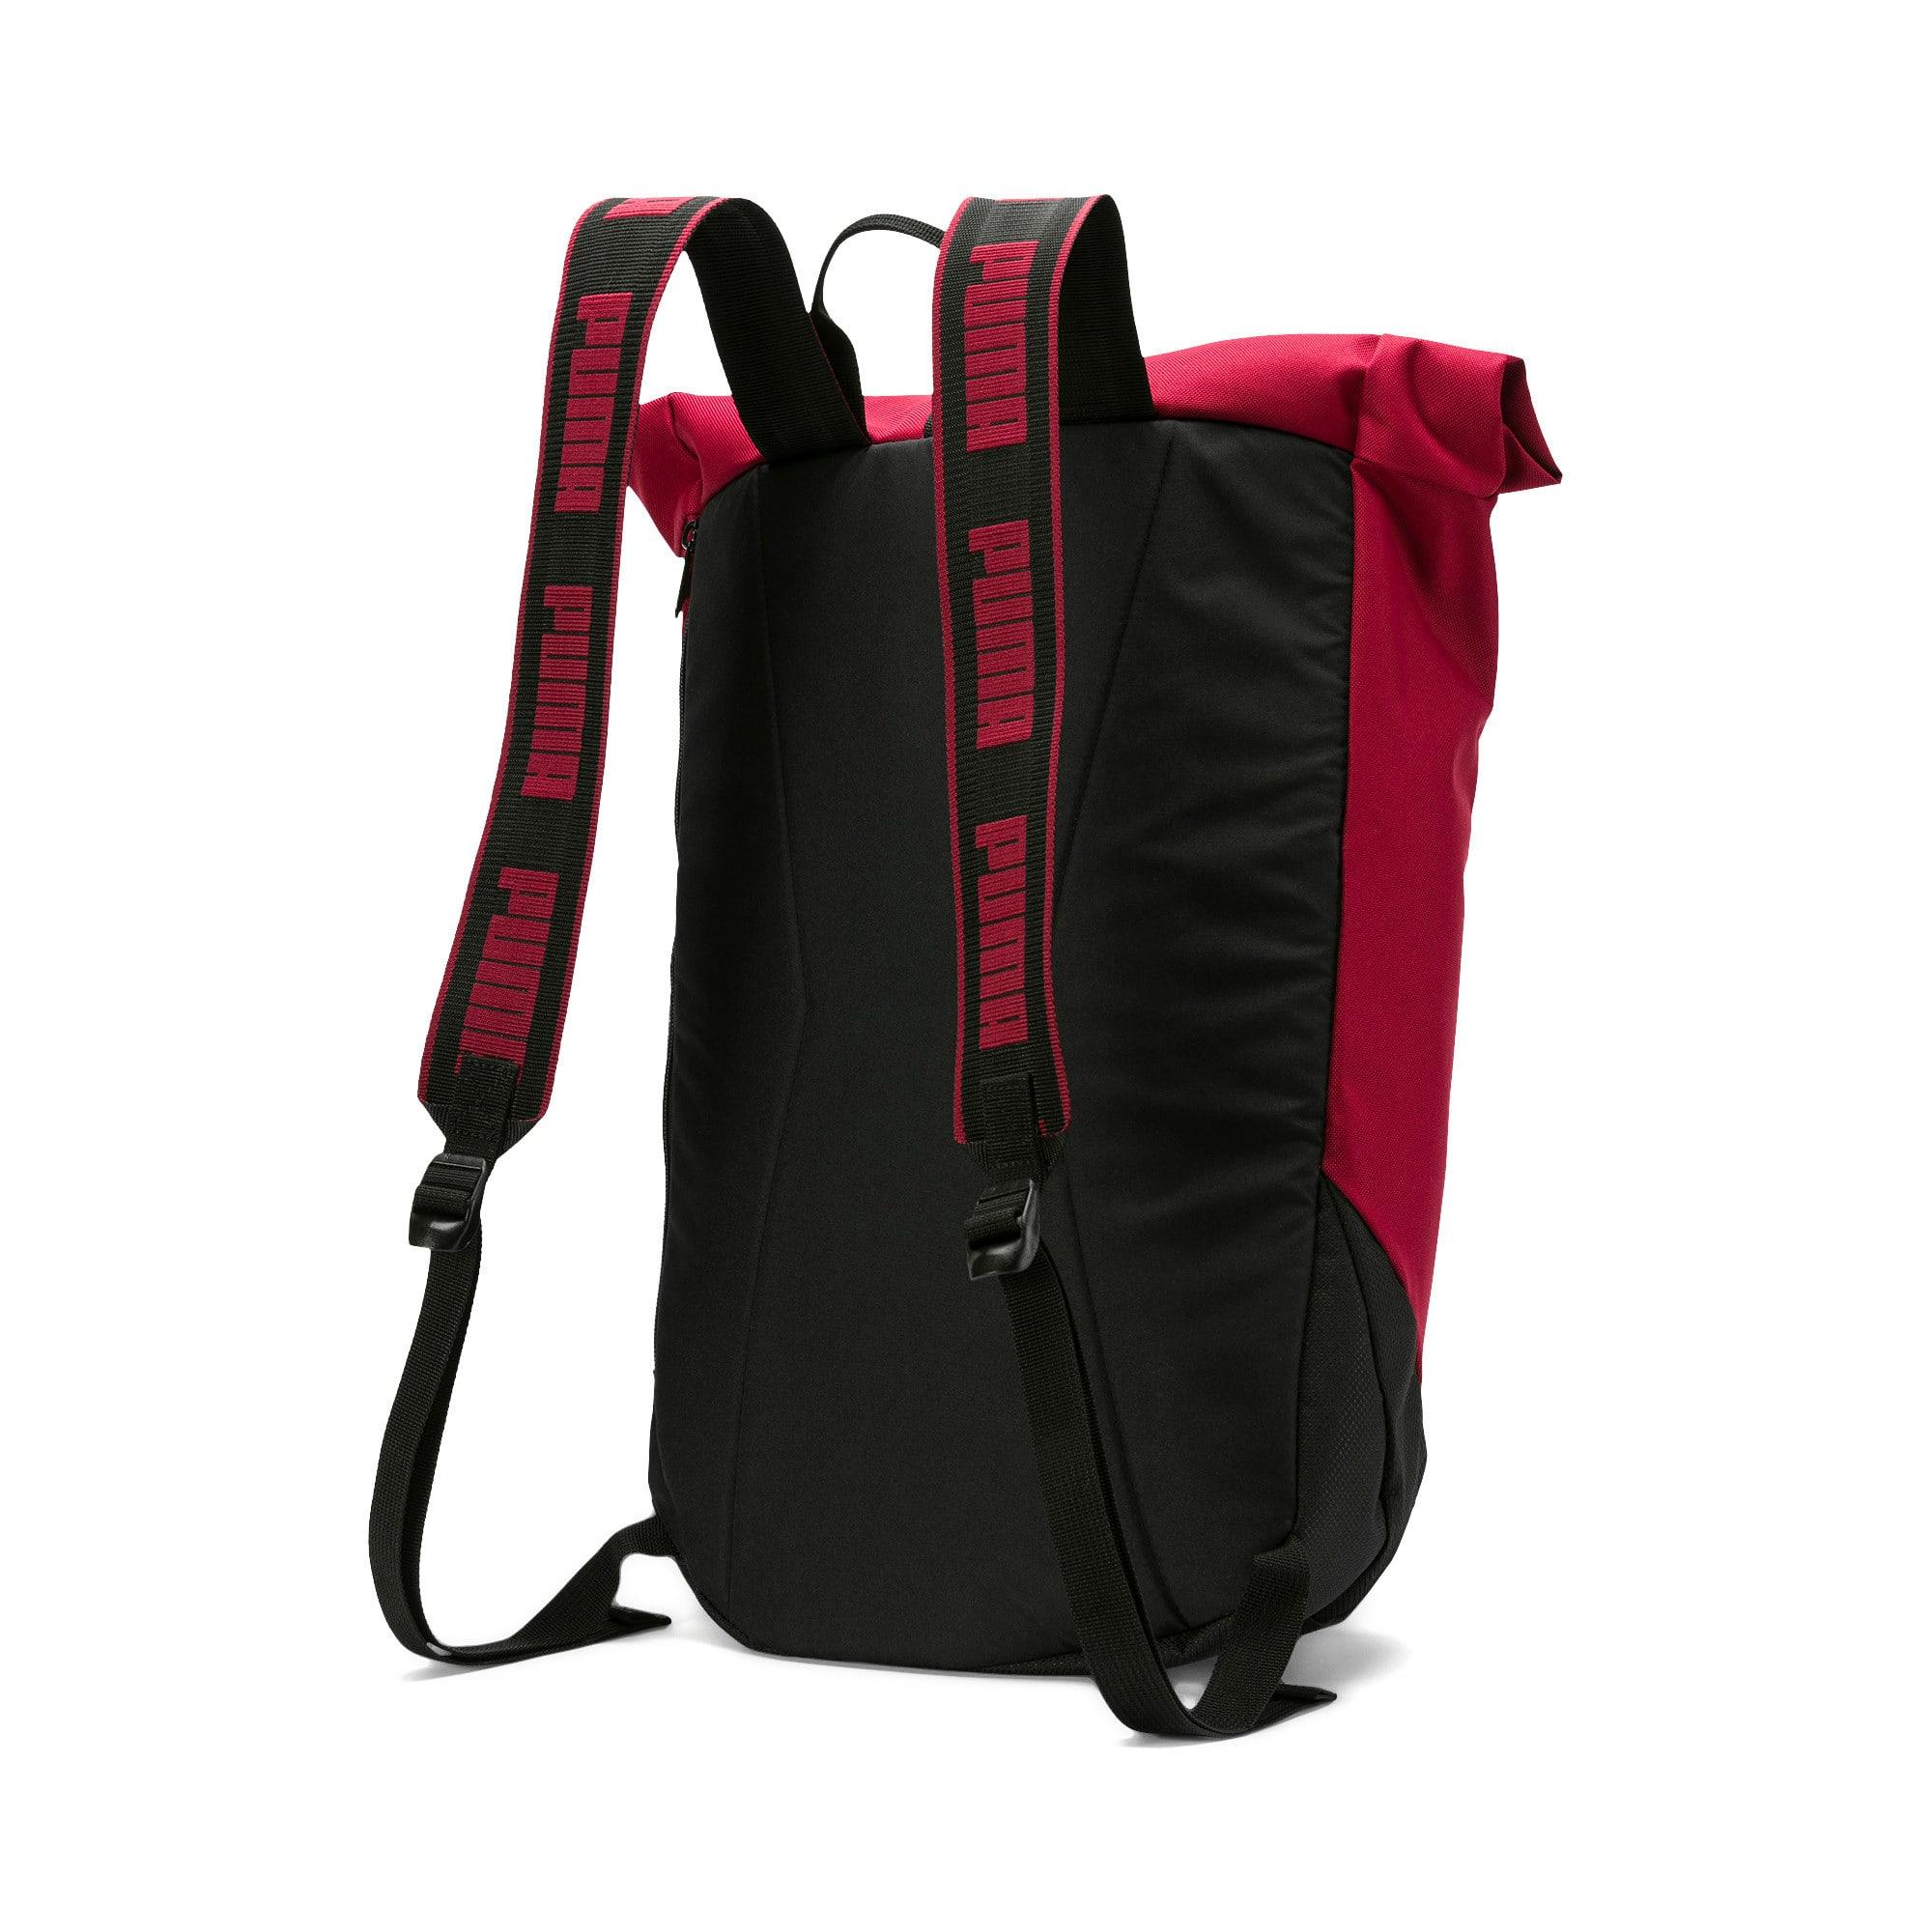 Thumbnail 2 of Sole Backpack, Rhubarb, medium